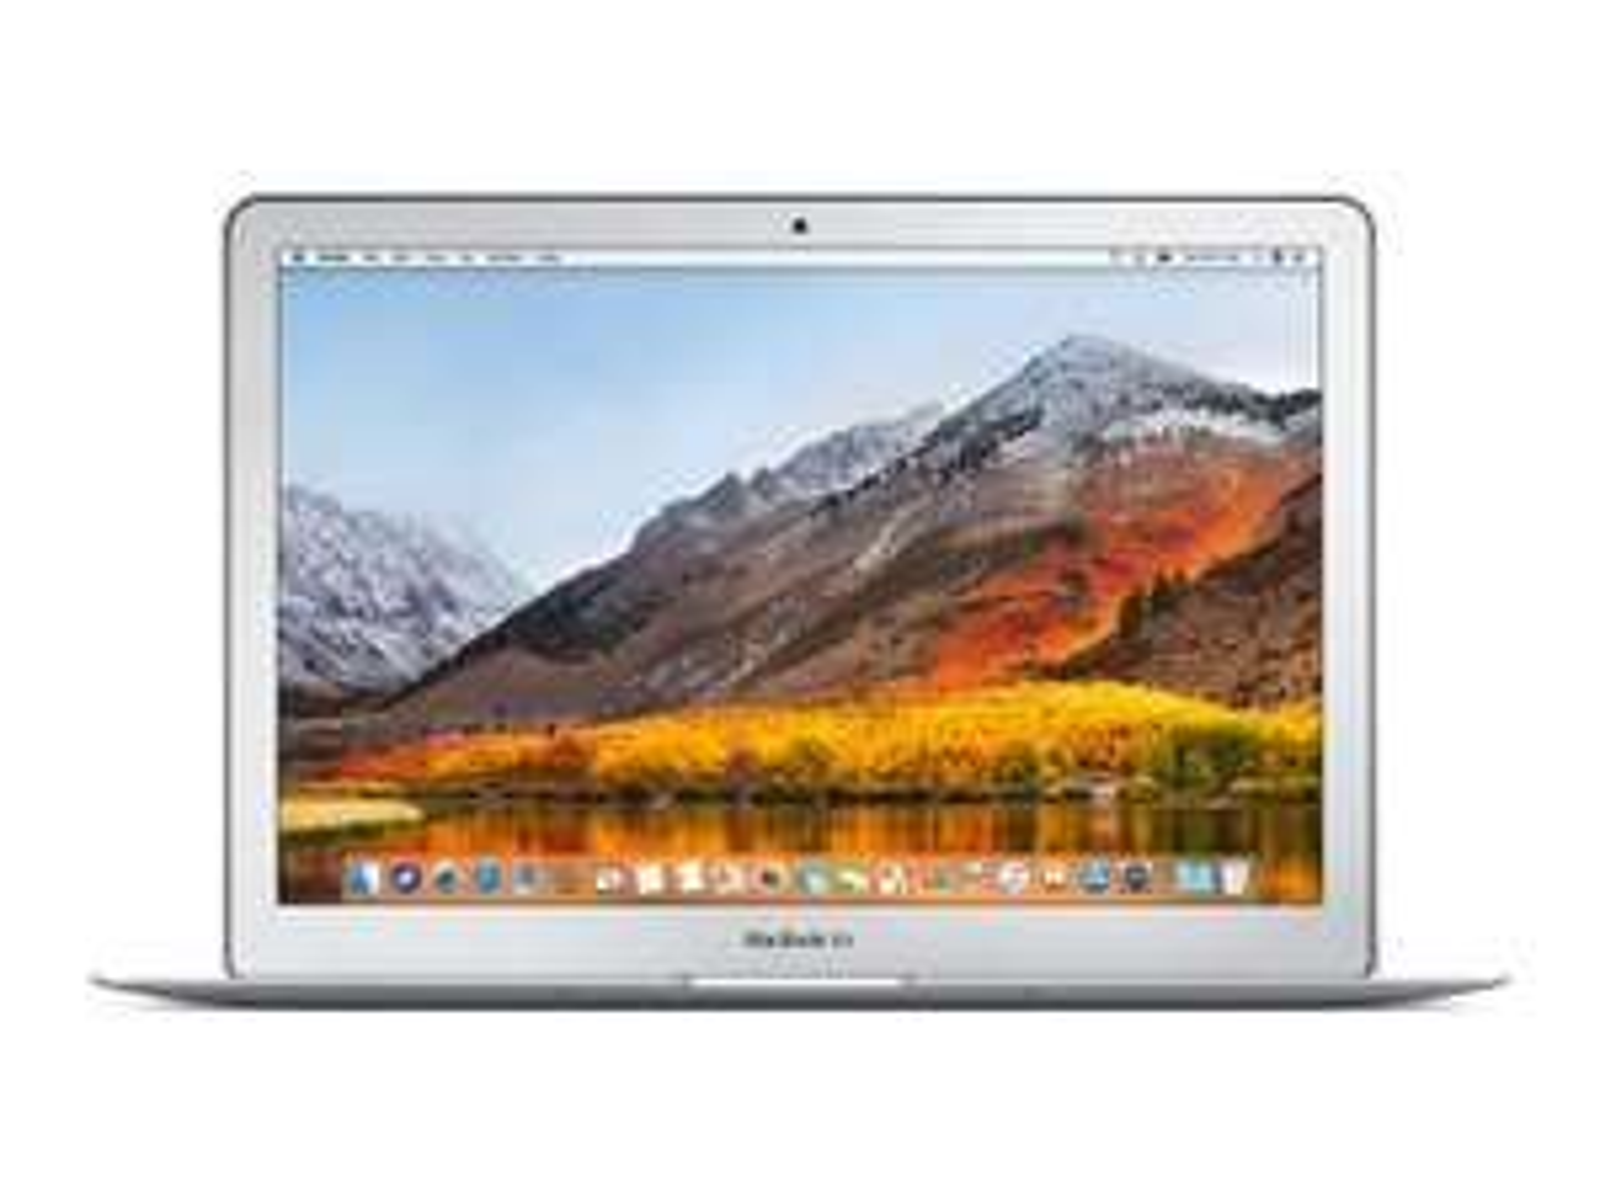 "MacBook Air 13"", Intel i5 1,8 GHz, 8 GB RAM, 128 GB SSD (2017) {ebayPLUS>GRAVIS}"